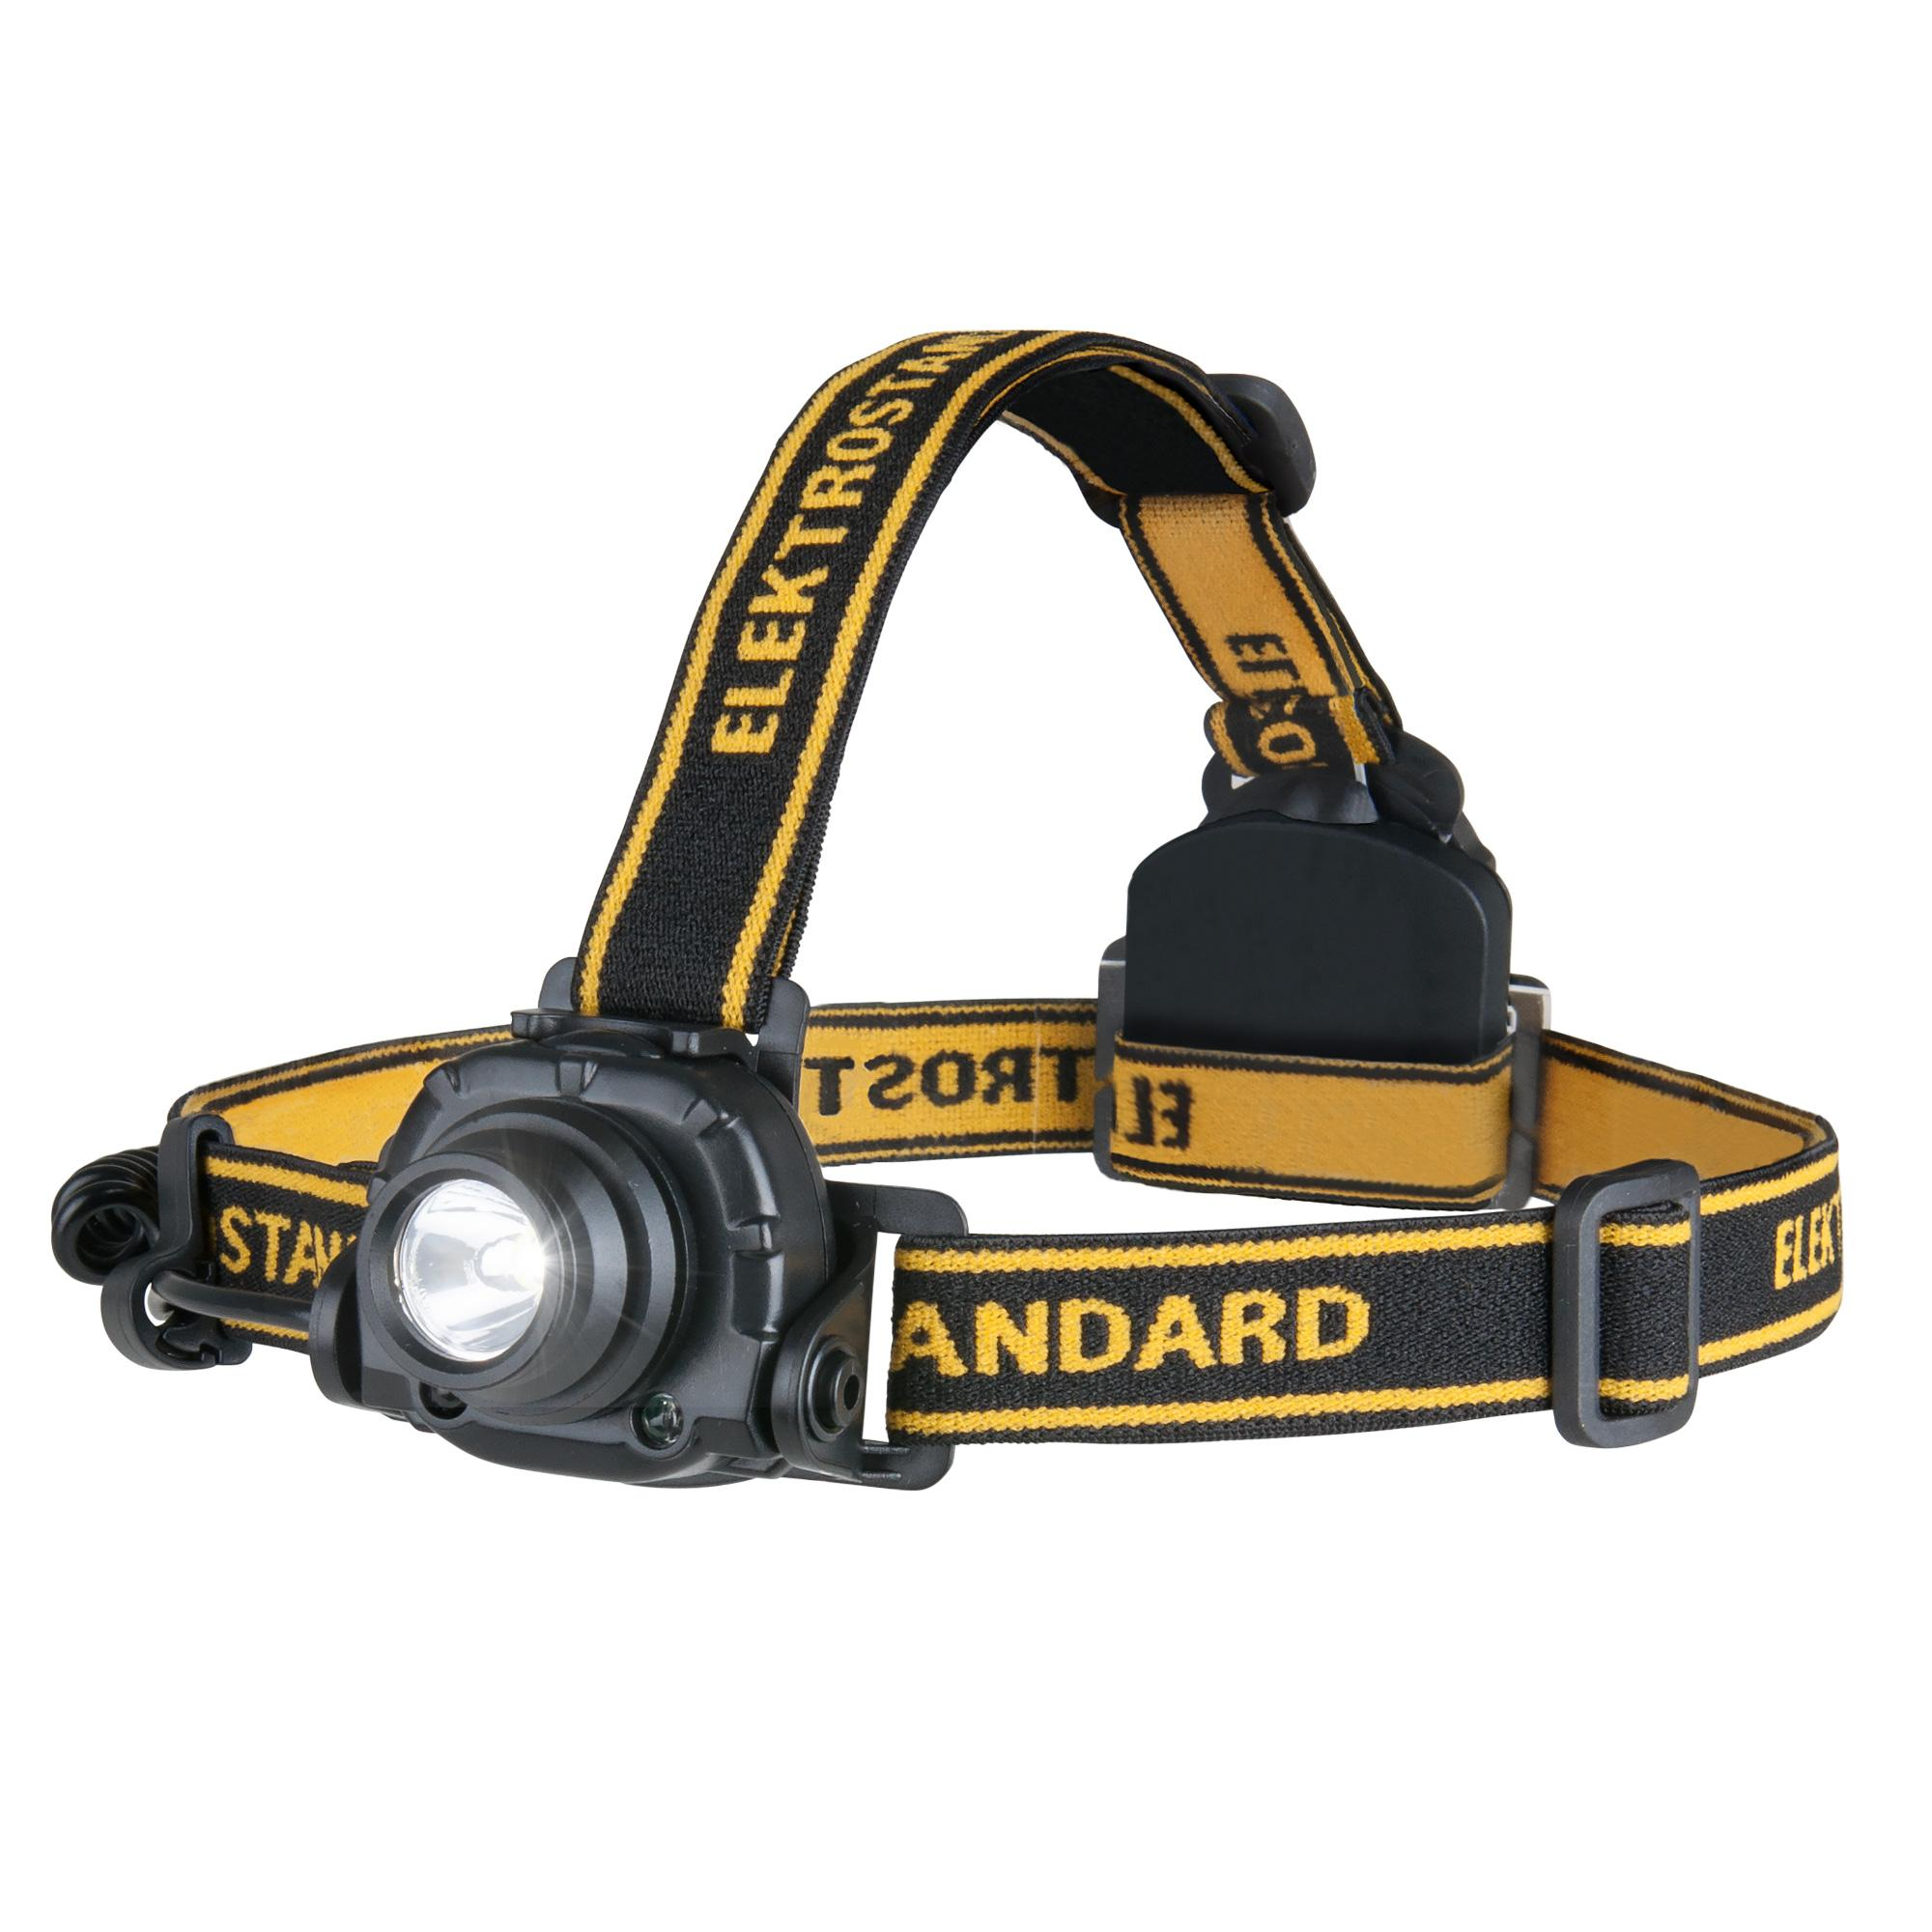 Налобный фонарь Wizard FL50